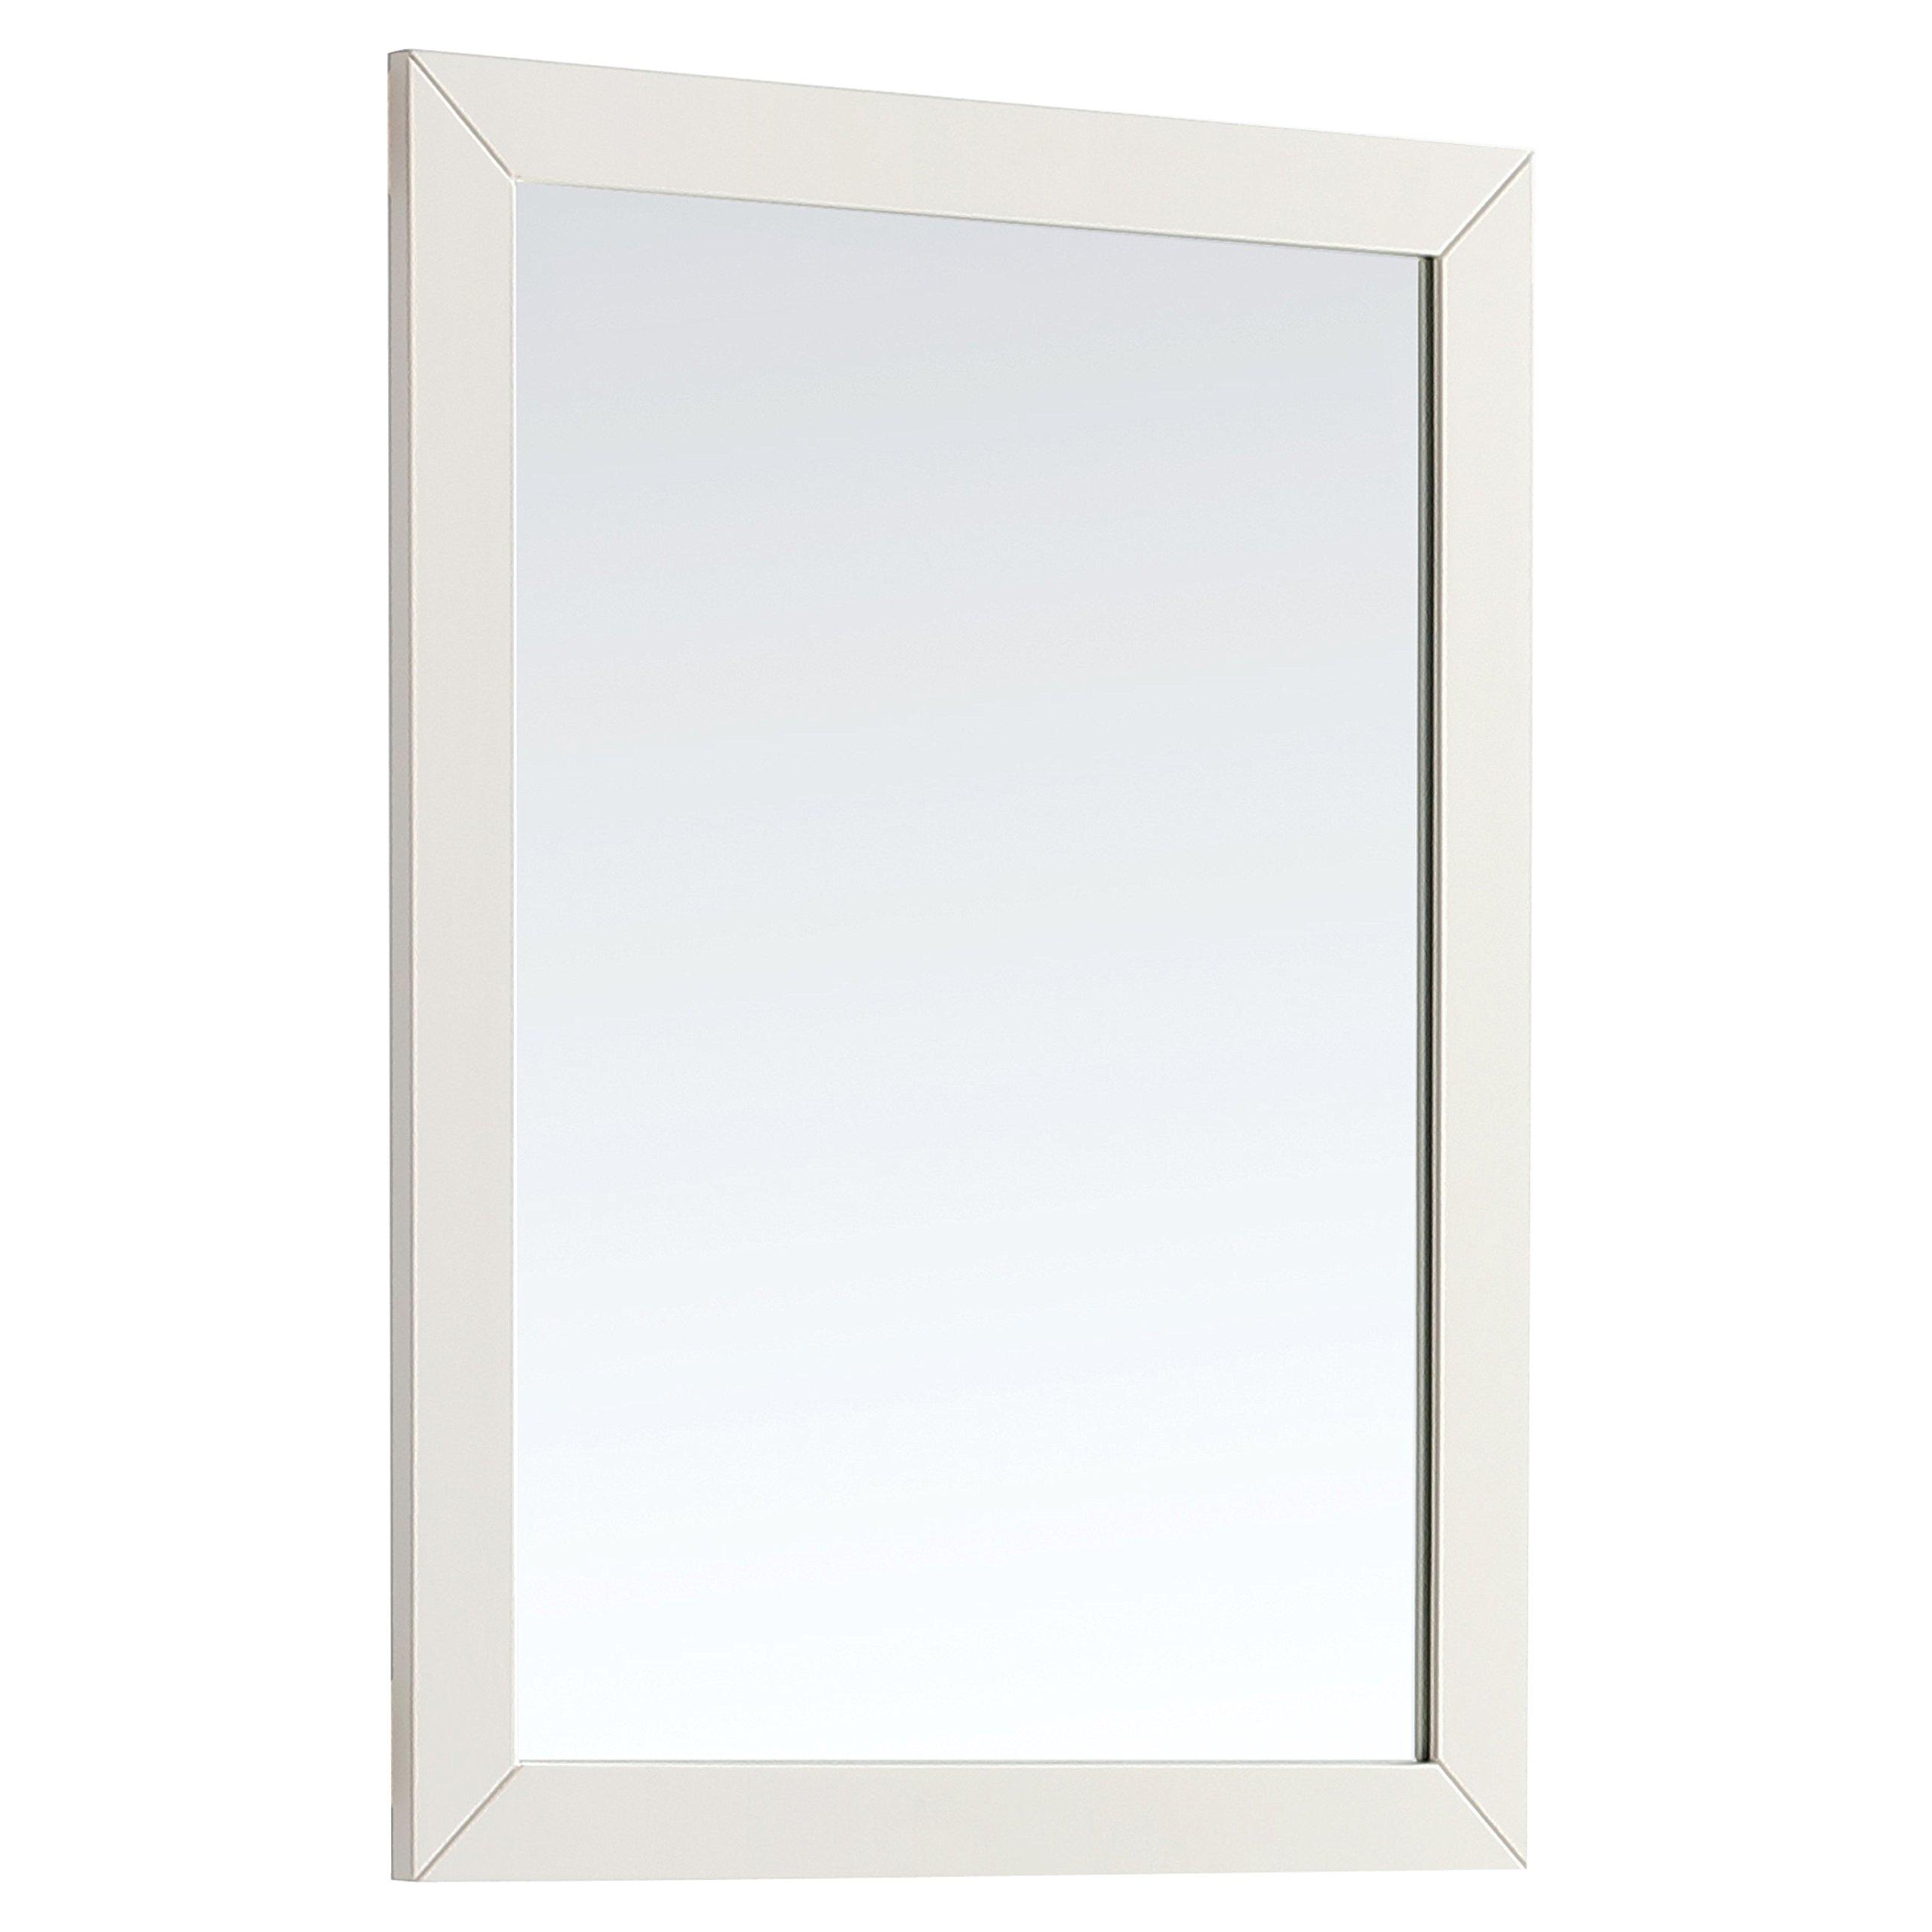 Simpli Home Paige 24'' x 34'' Bath Vanity Décor Mirror, Soft White